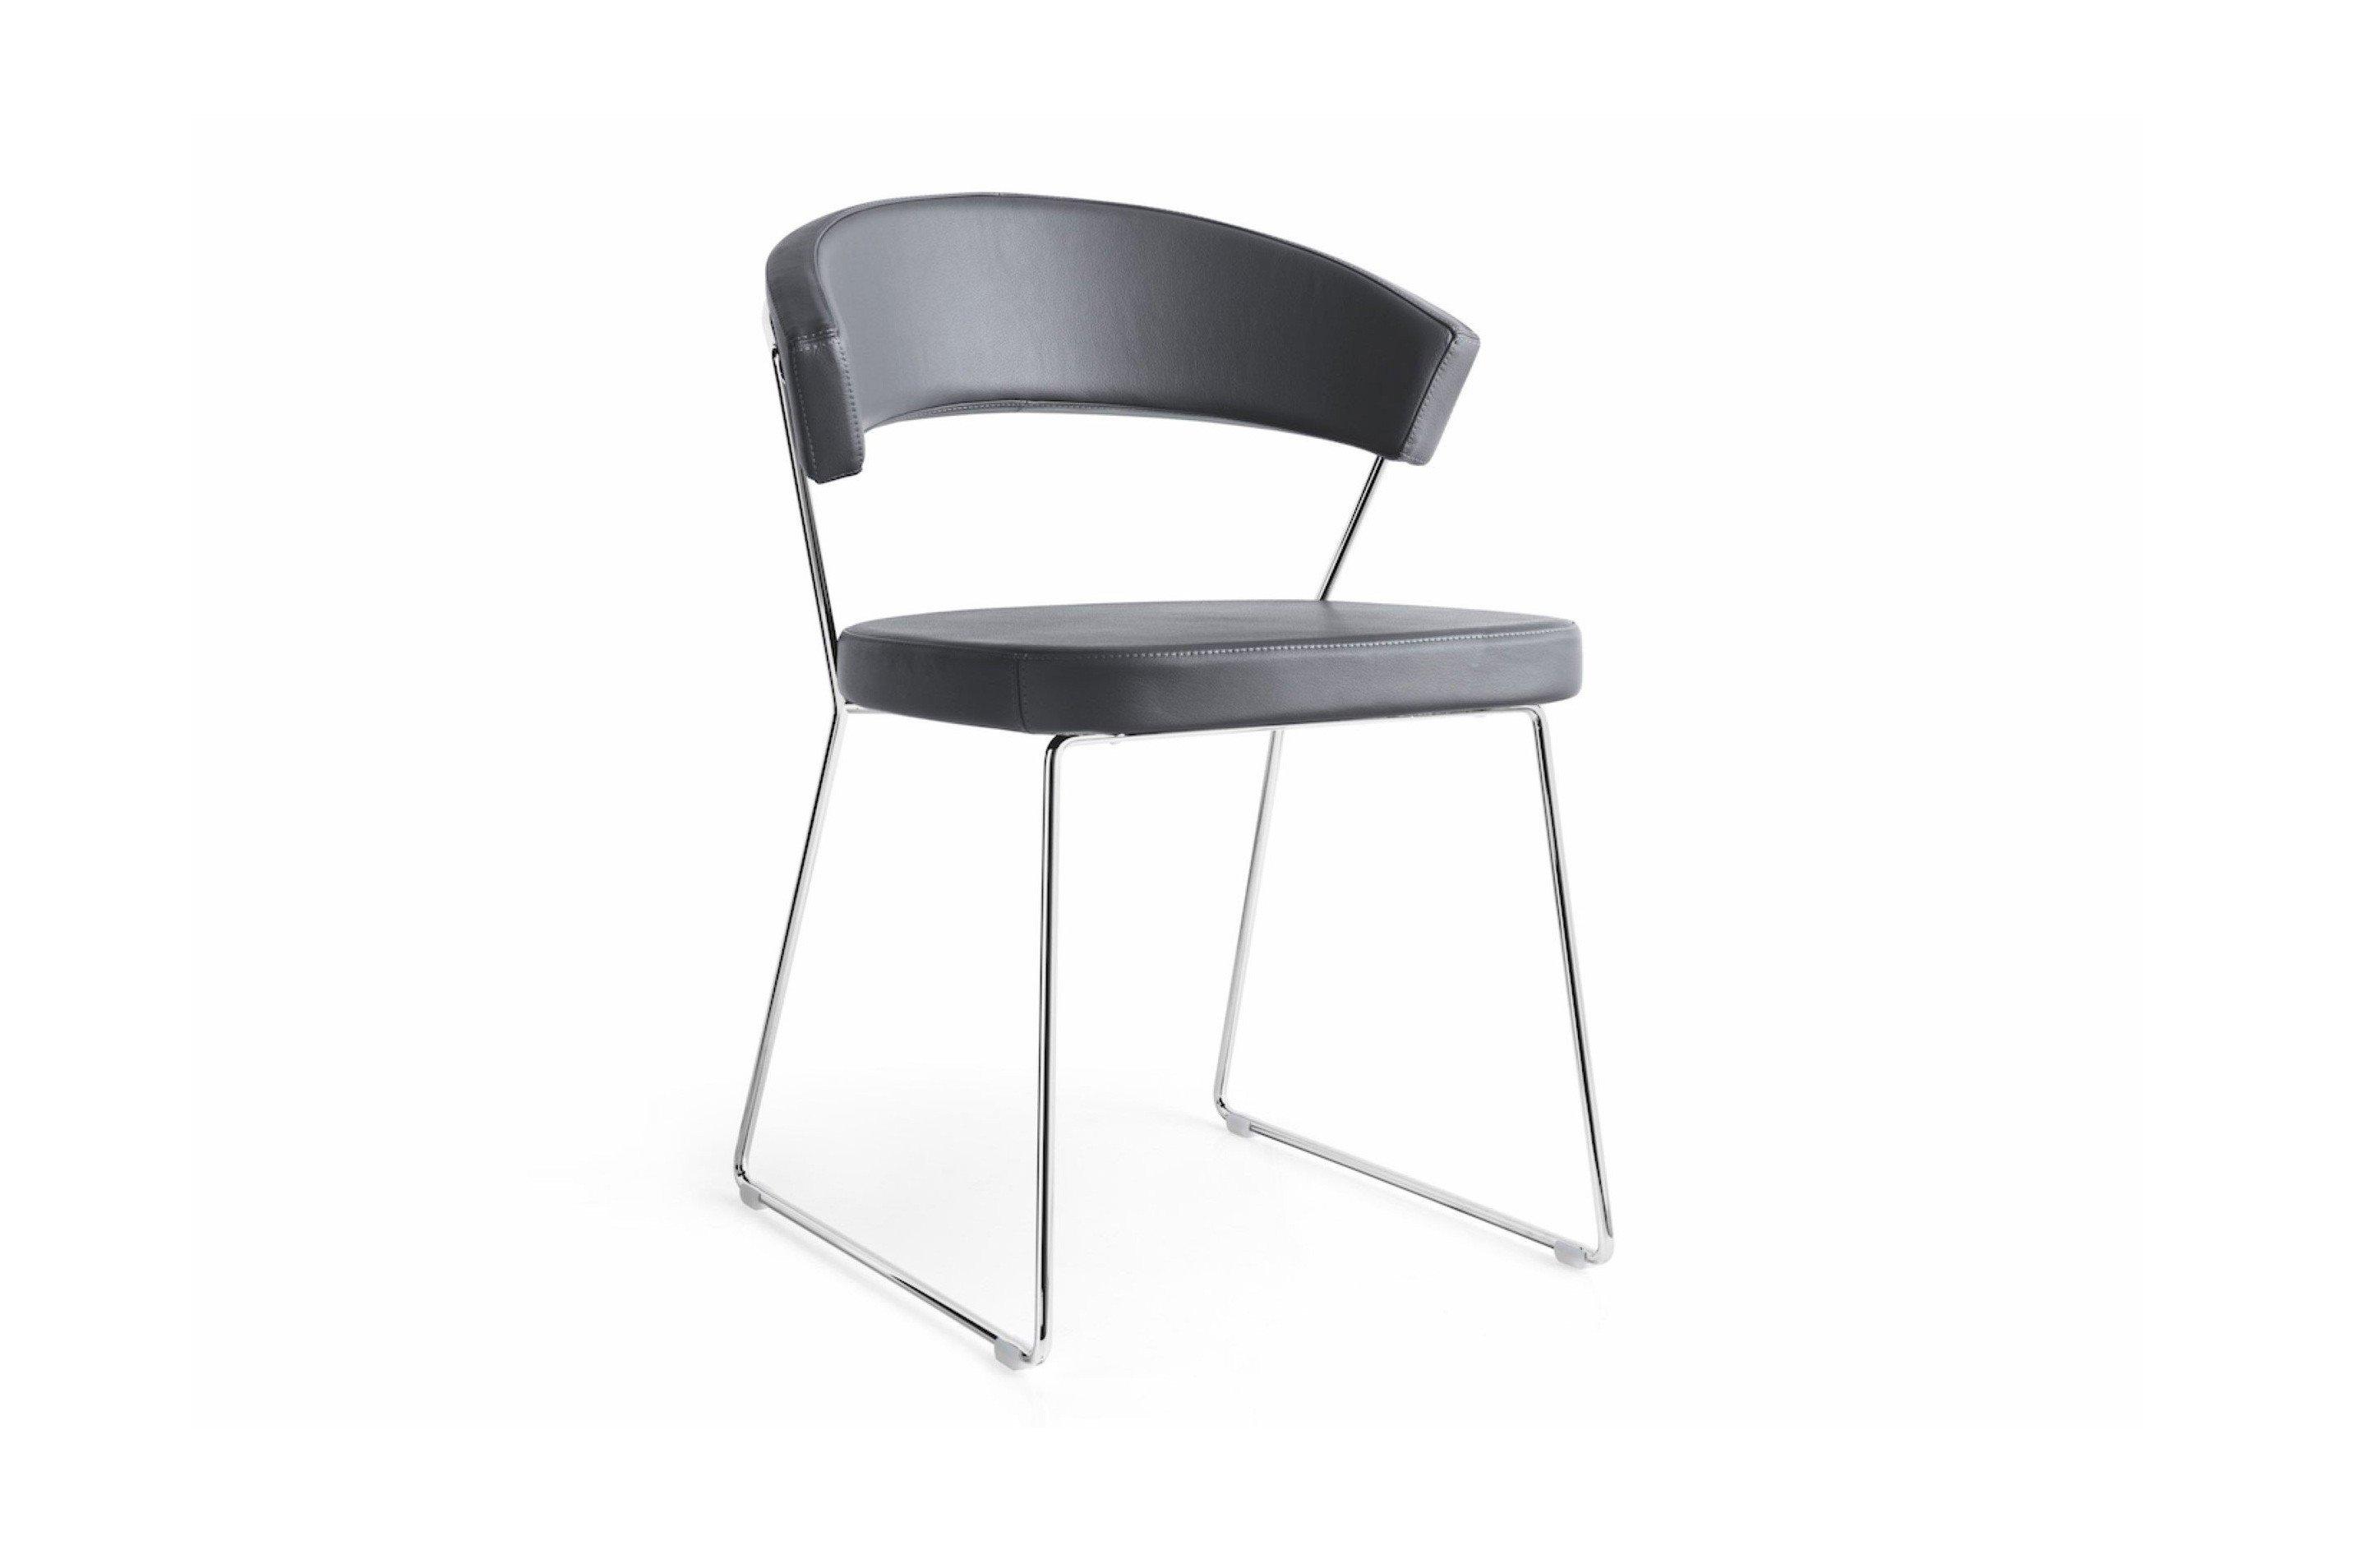 stuhl grau basil stuhl esszimmer wartezimmer stoff grau u kupfer with stuhl grau good stuhl. Black Bedroom Furniture Sets. Home Design Ideas